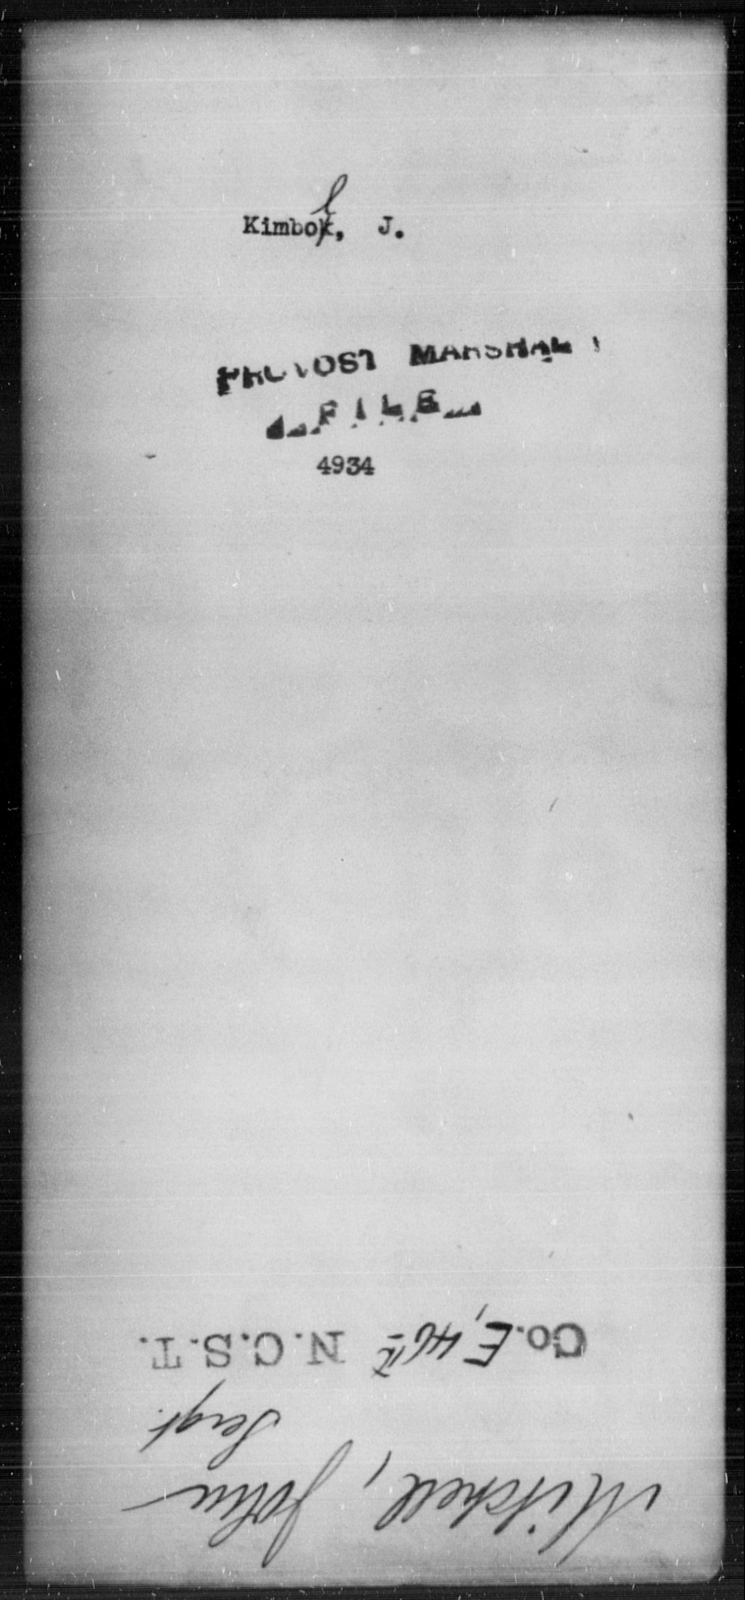 Kimbol, J - State: [Blank] - Year: [Blank]